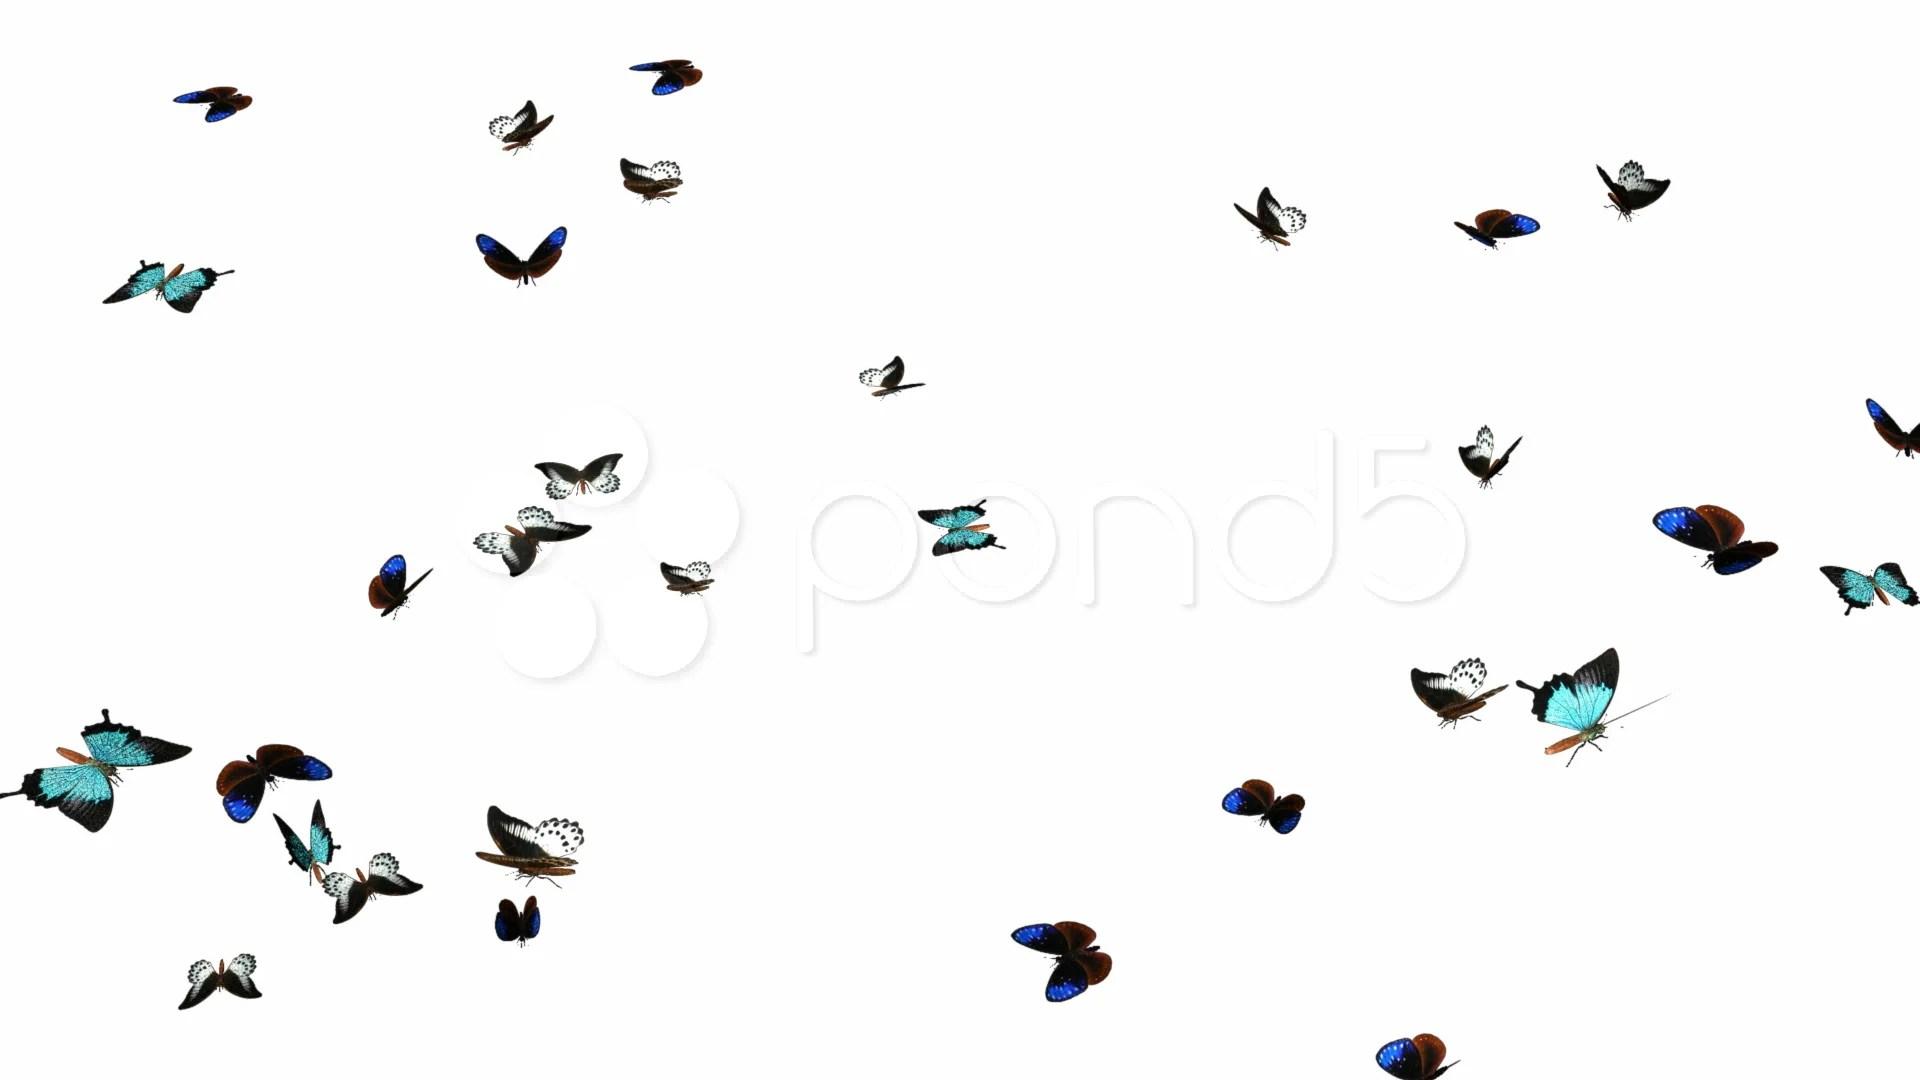 Looping Butterflies Slow Swarm Animation 2 Hi Res